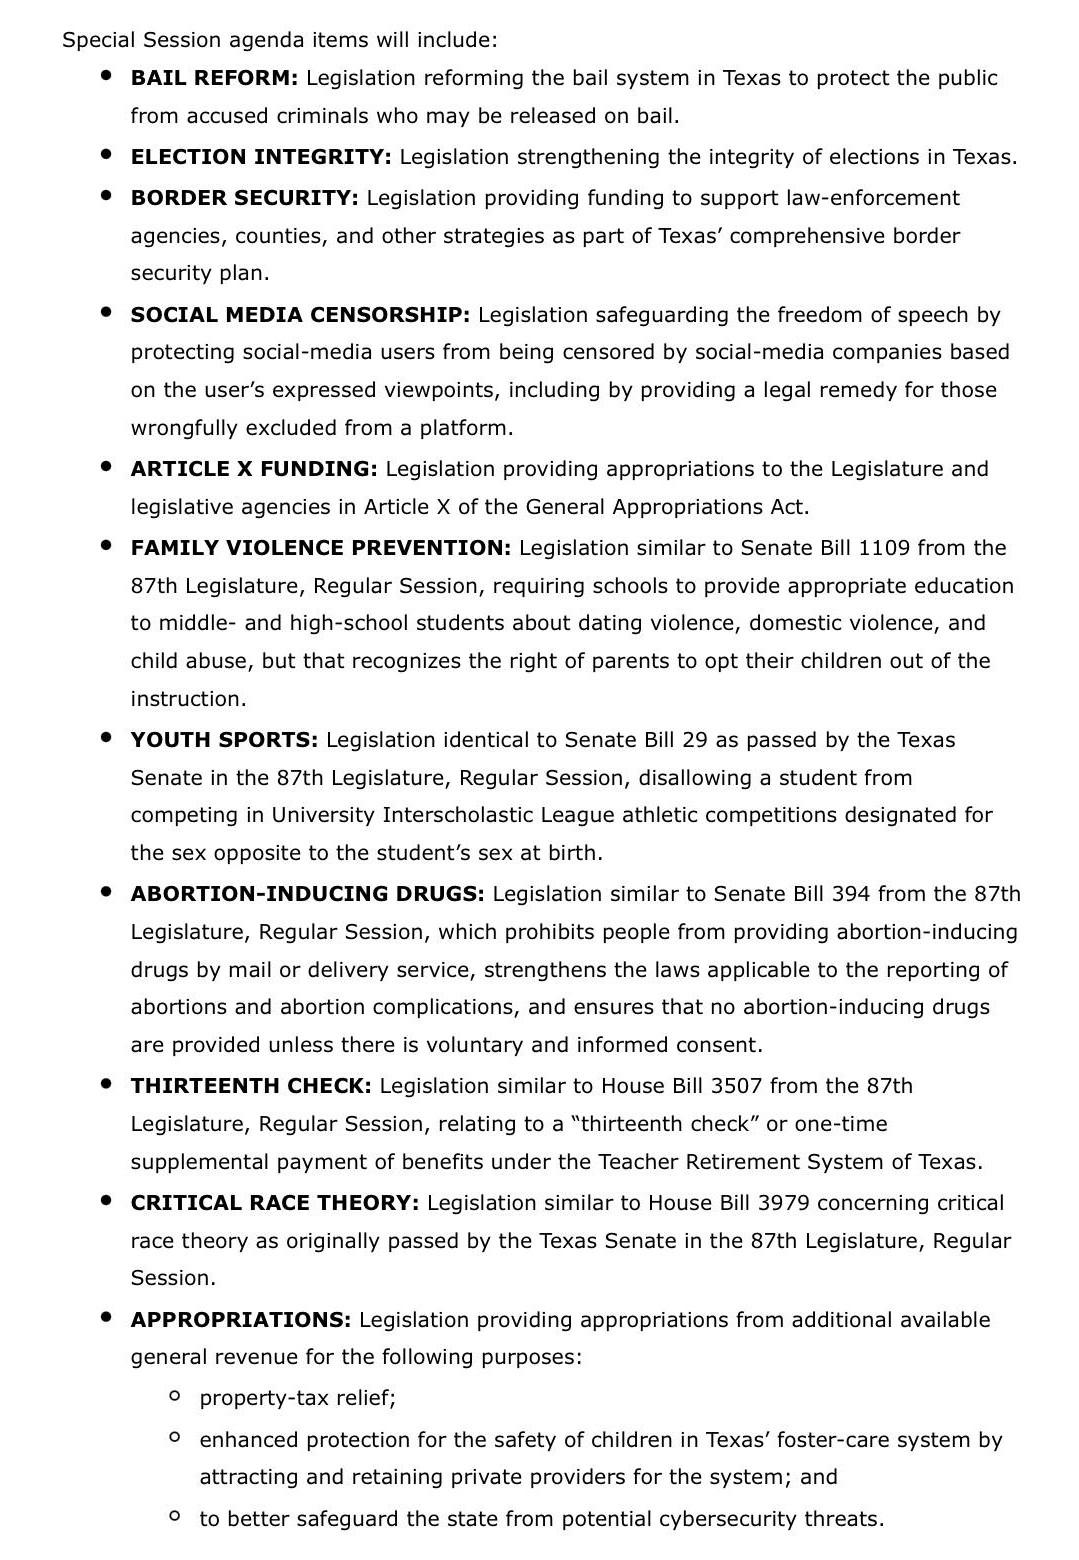 Special Session Agenda